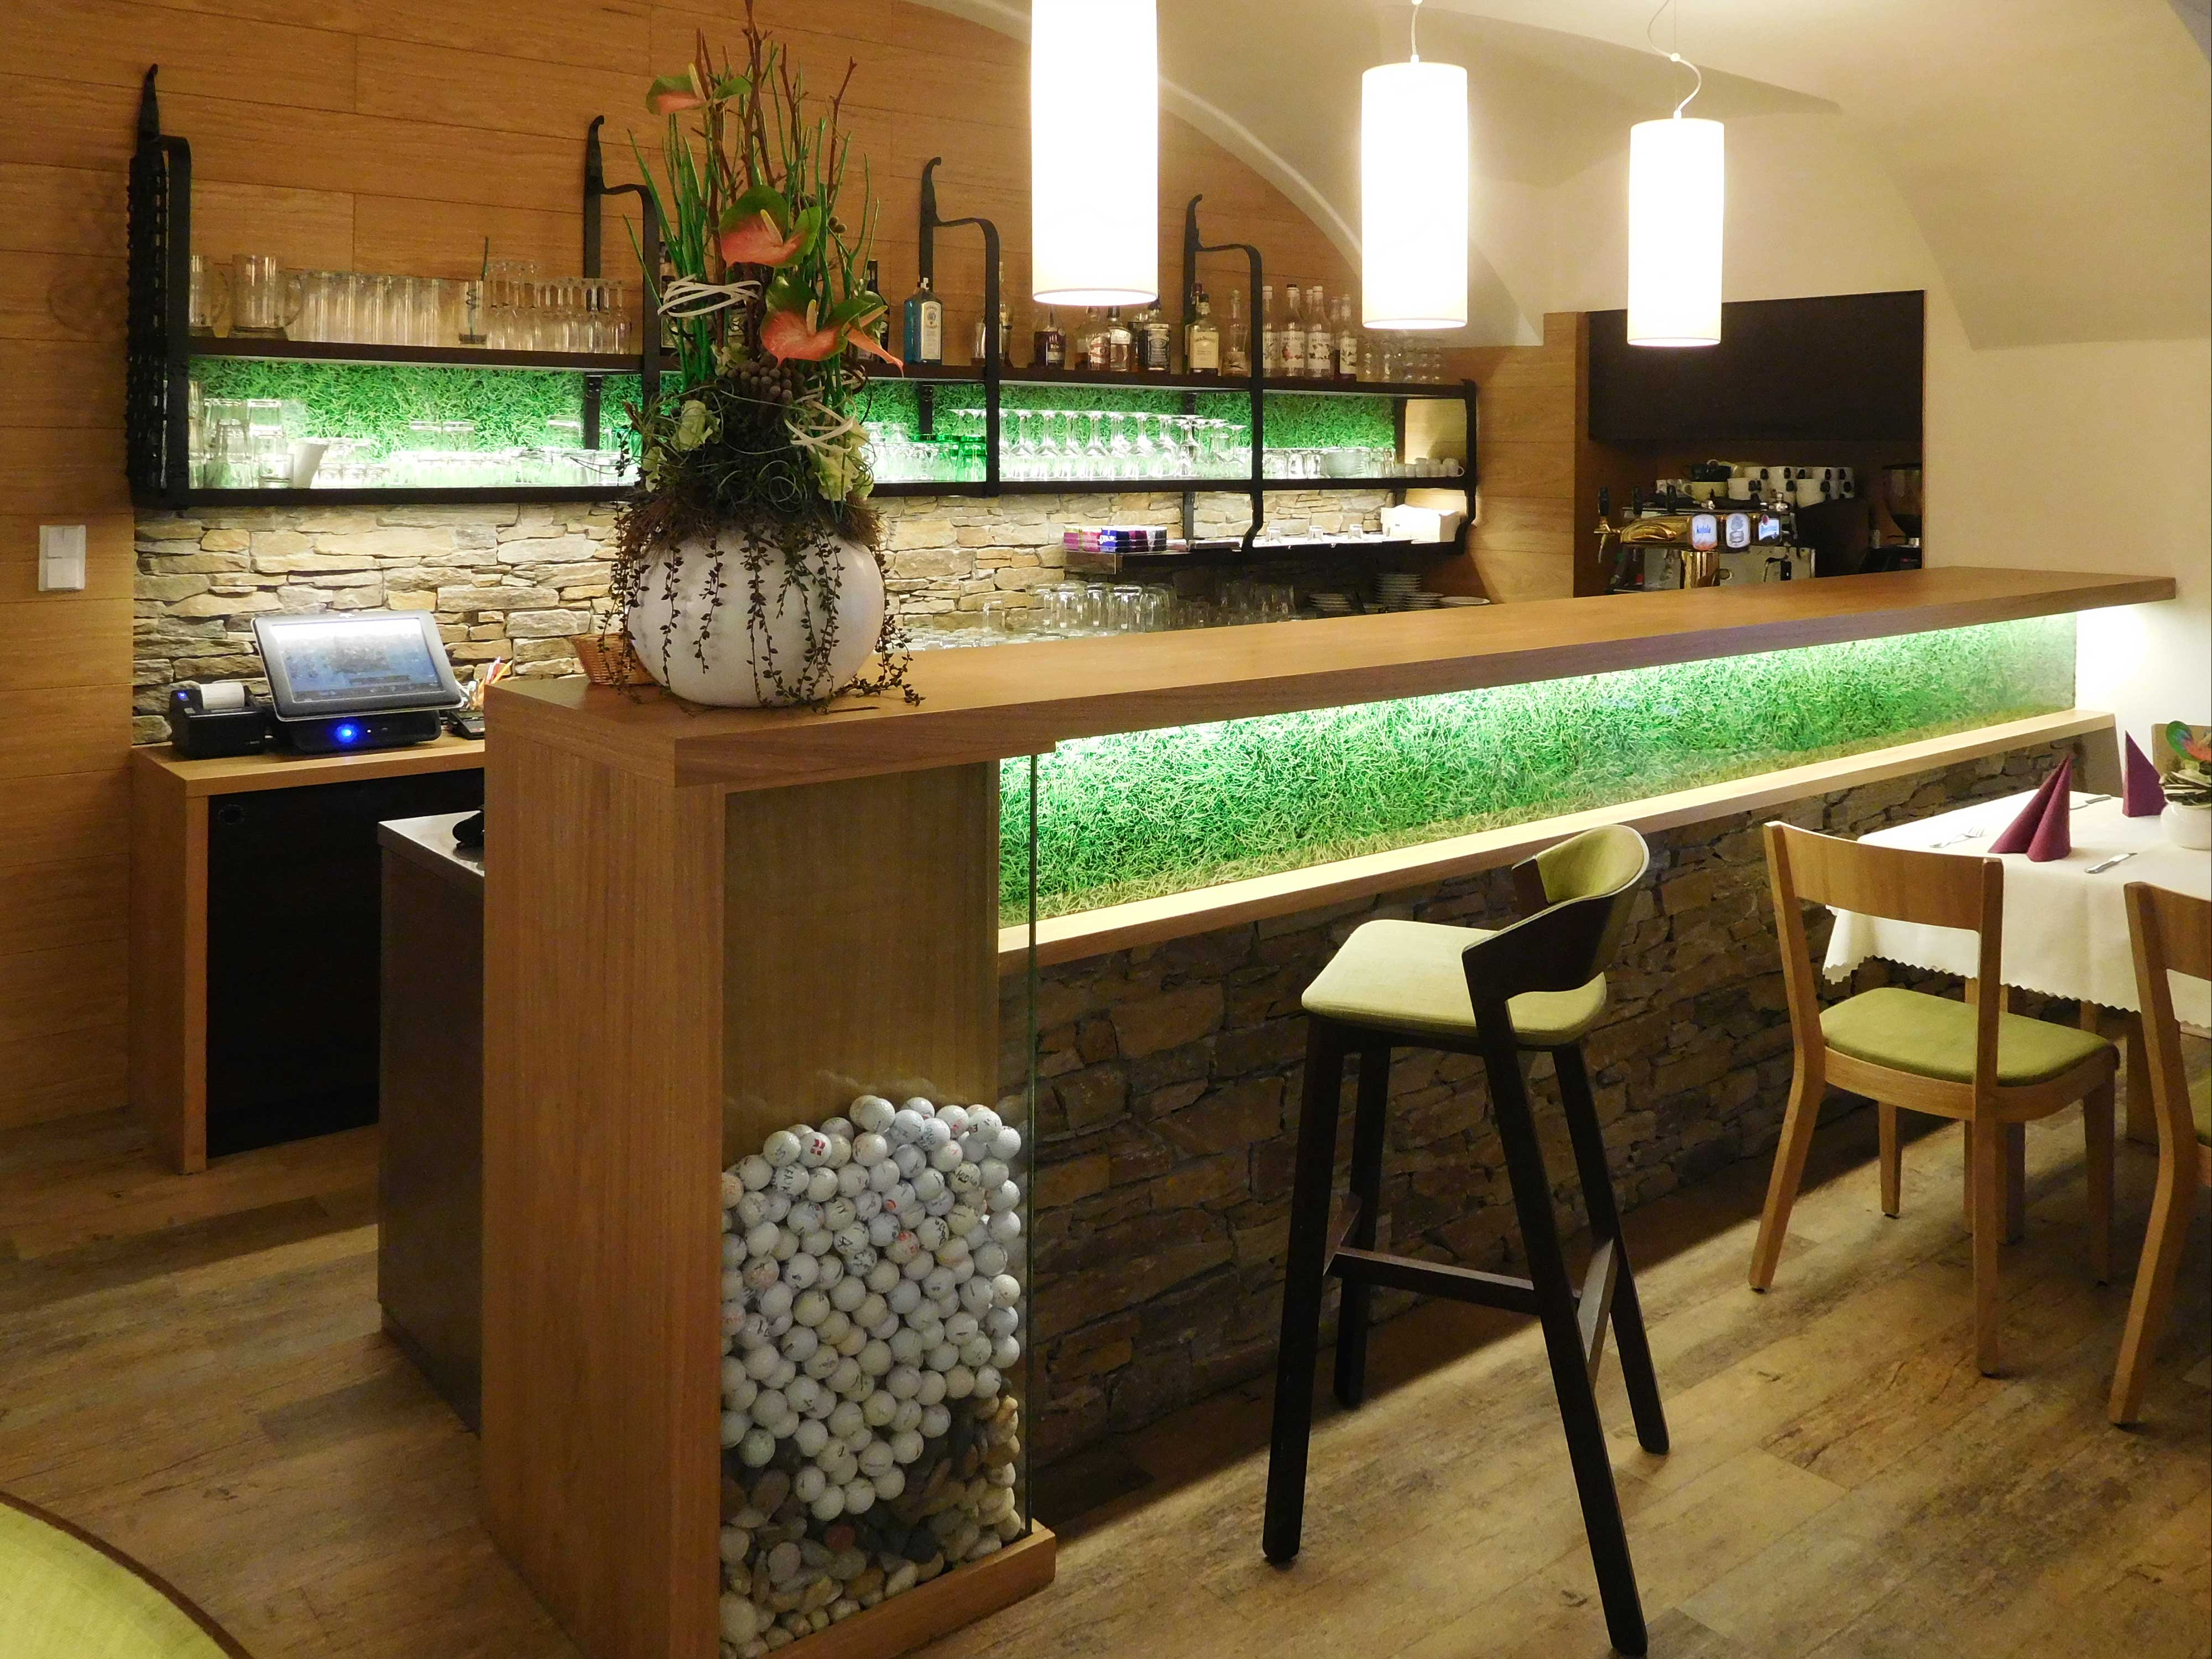 tisnovska_rychta_interier restaurace